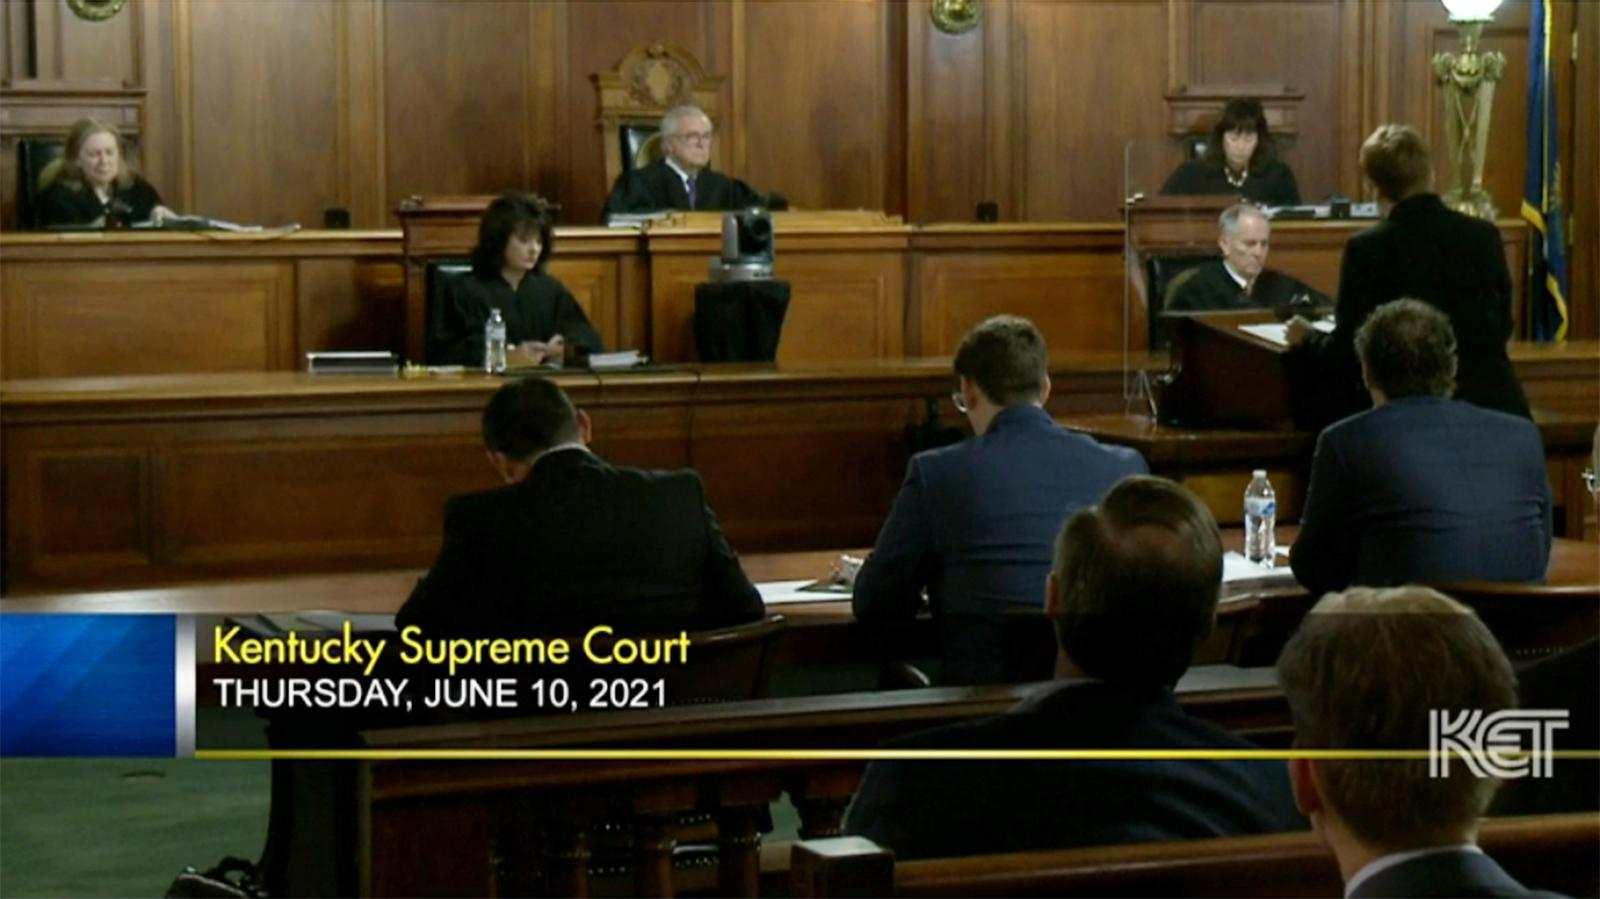 Kentucky Supreme Court hears executive powers cases